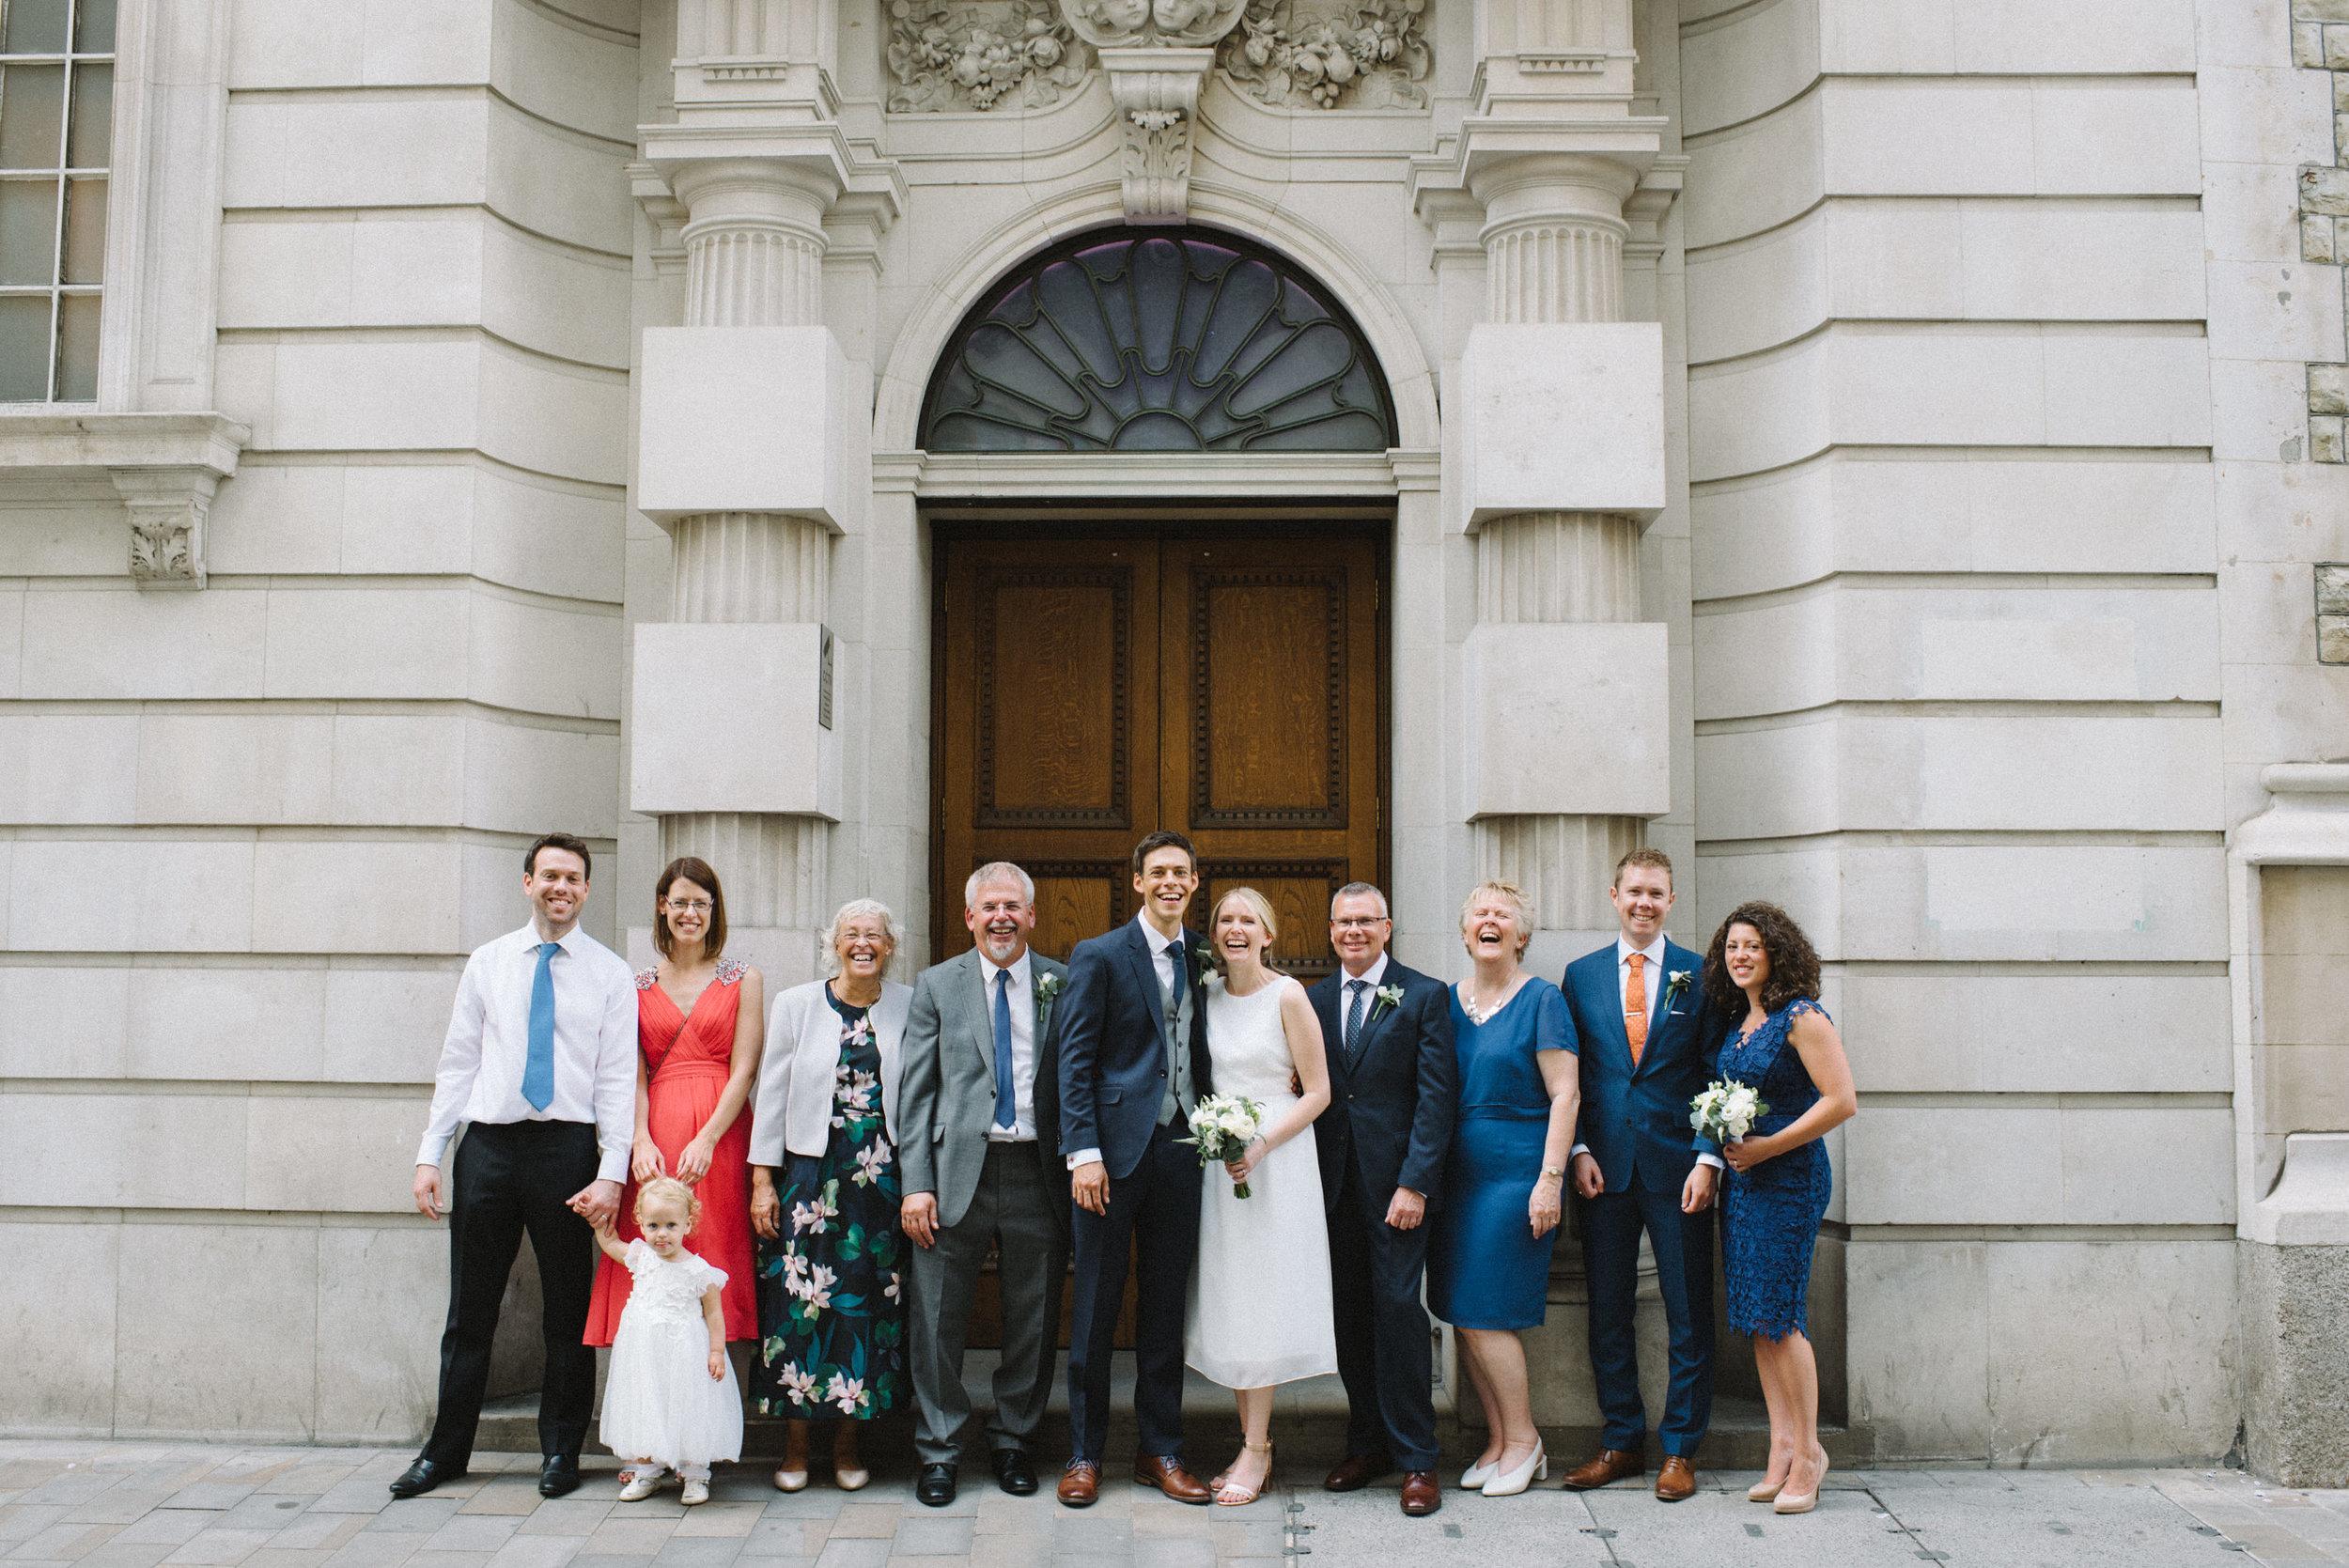 0142-LISA-DEVINE-PHOTOGRAPHY-ALTERNATIVE-WEDDING-PHOTOGRAPHY-SCOTLAND-DESTINATION-WEDDINGS-GLASGOW-WEDDINGS-COOL-WEDDINGS-STYLISH-WEDDINGS.JPG